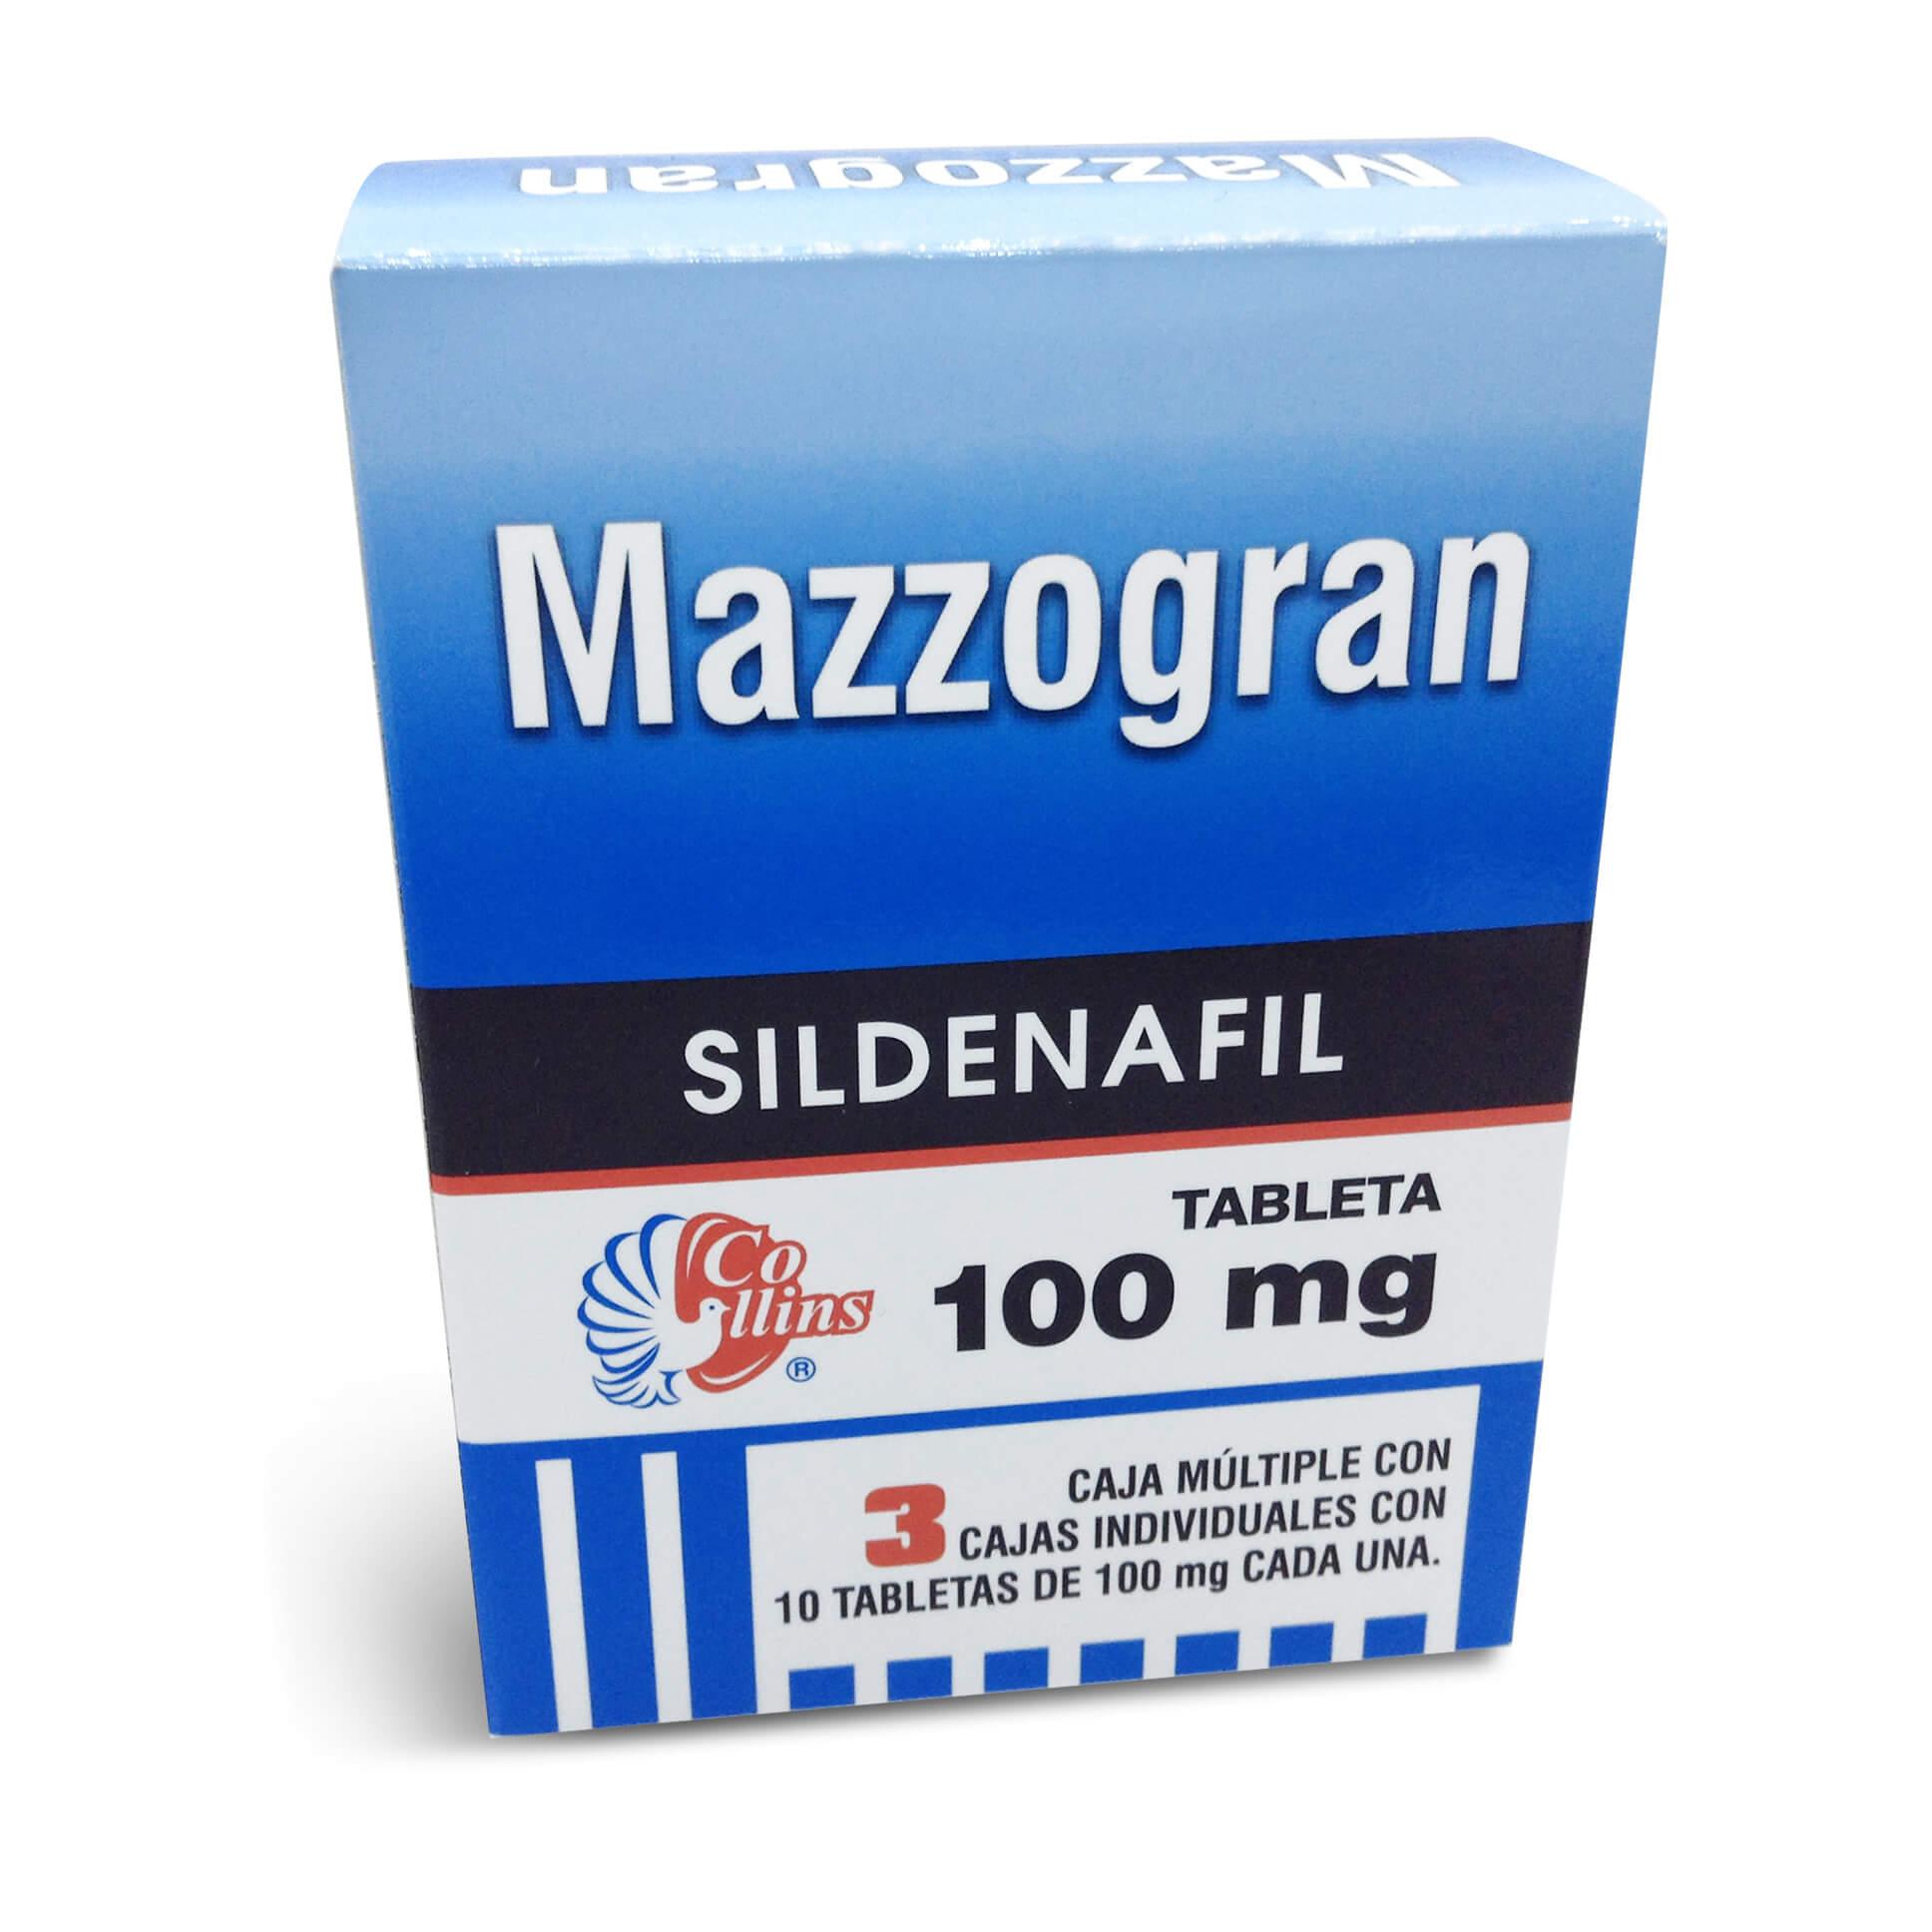 Mazzogran